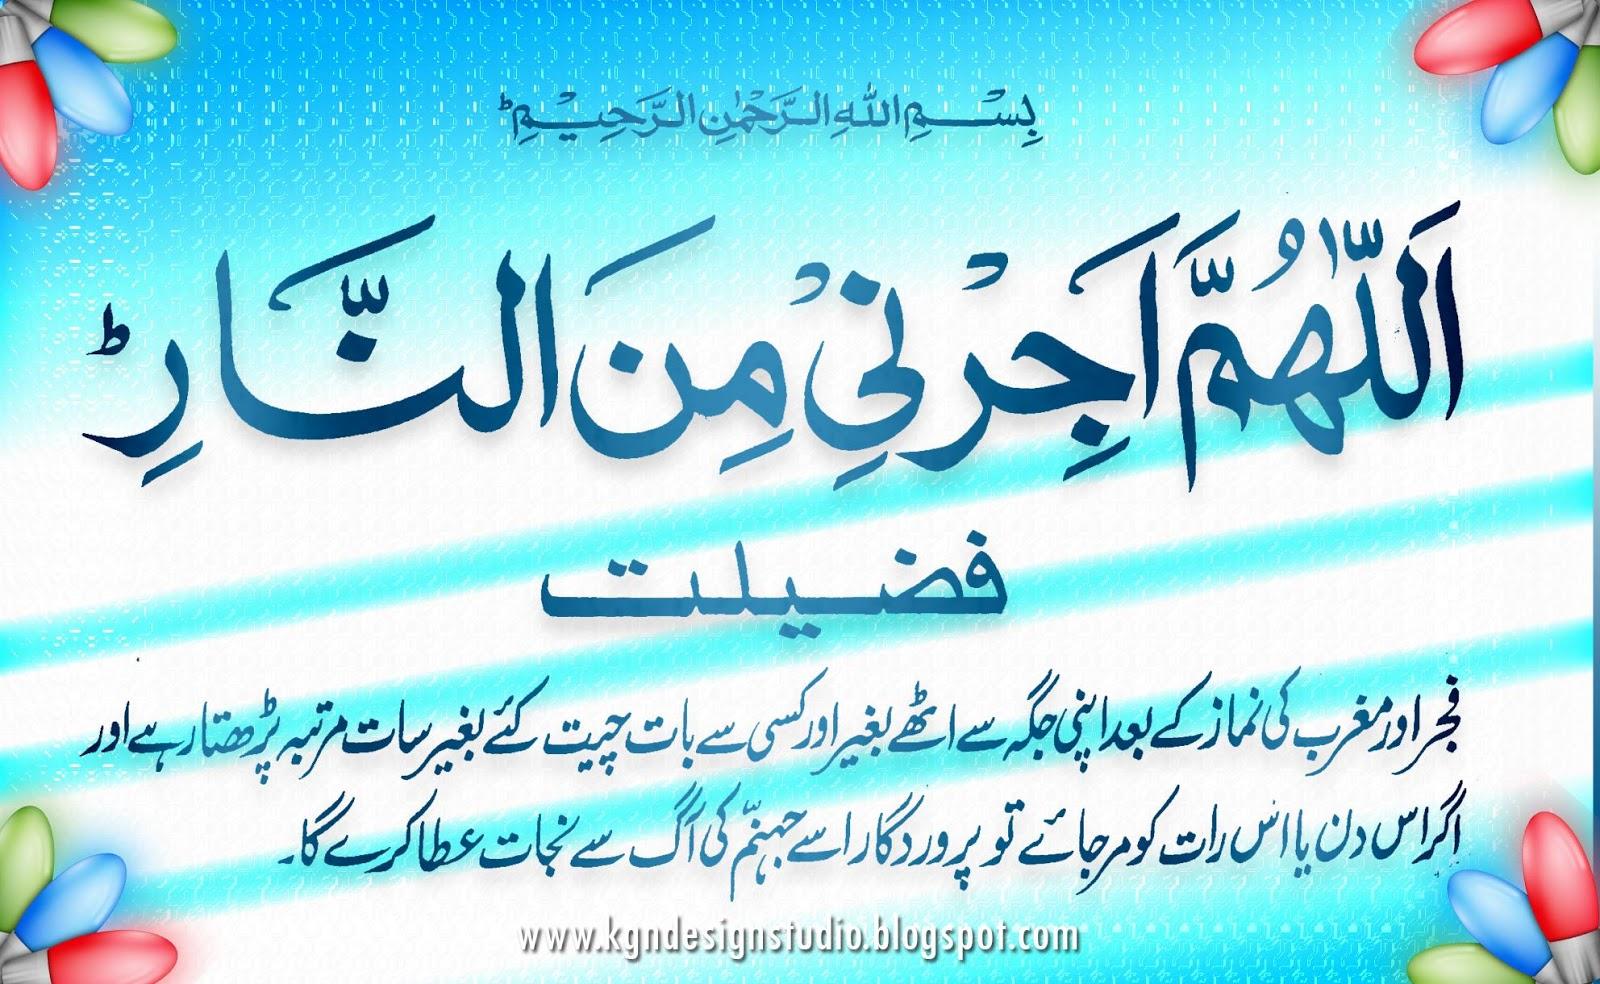 http://4.bp.blogspot.com/-Z56mlaVKjxs/UO-3I4HCXvI/AAAAAAAACr0/Ky9tzAtCOTA/s1600/Urdu+Hadees-10.jpg